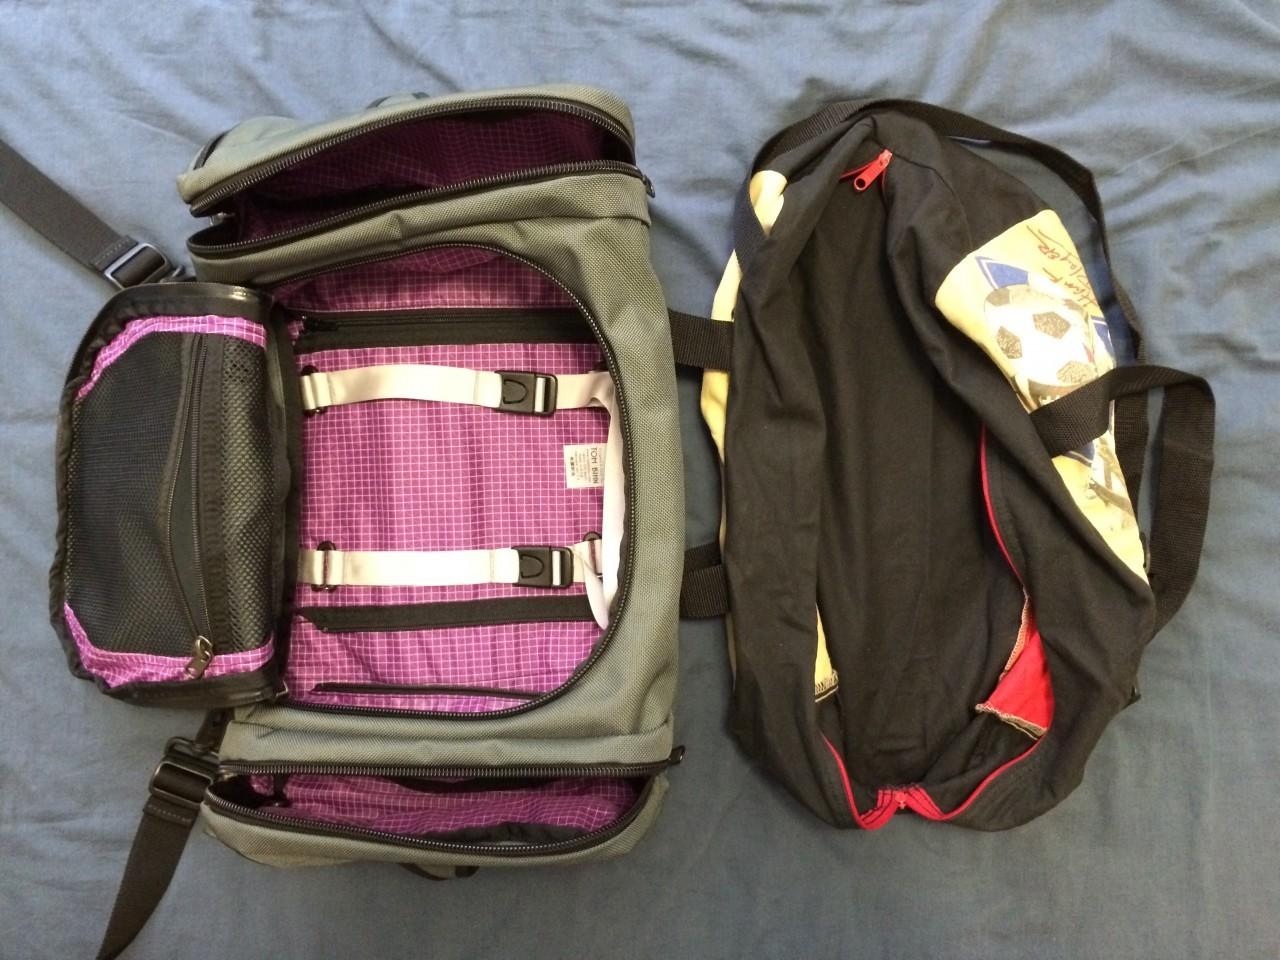 Duffel bags layout comparison